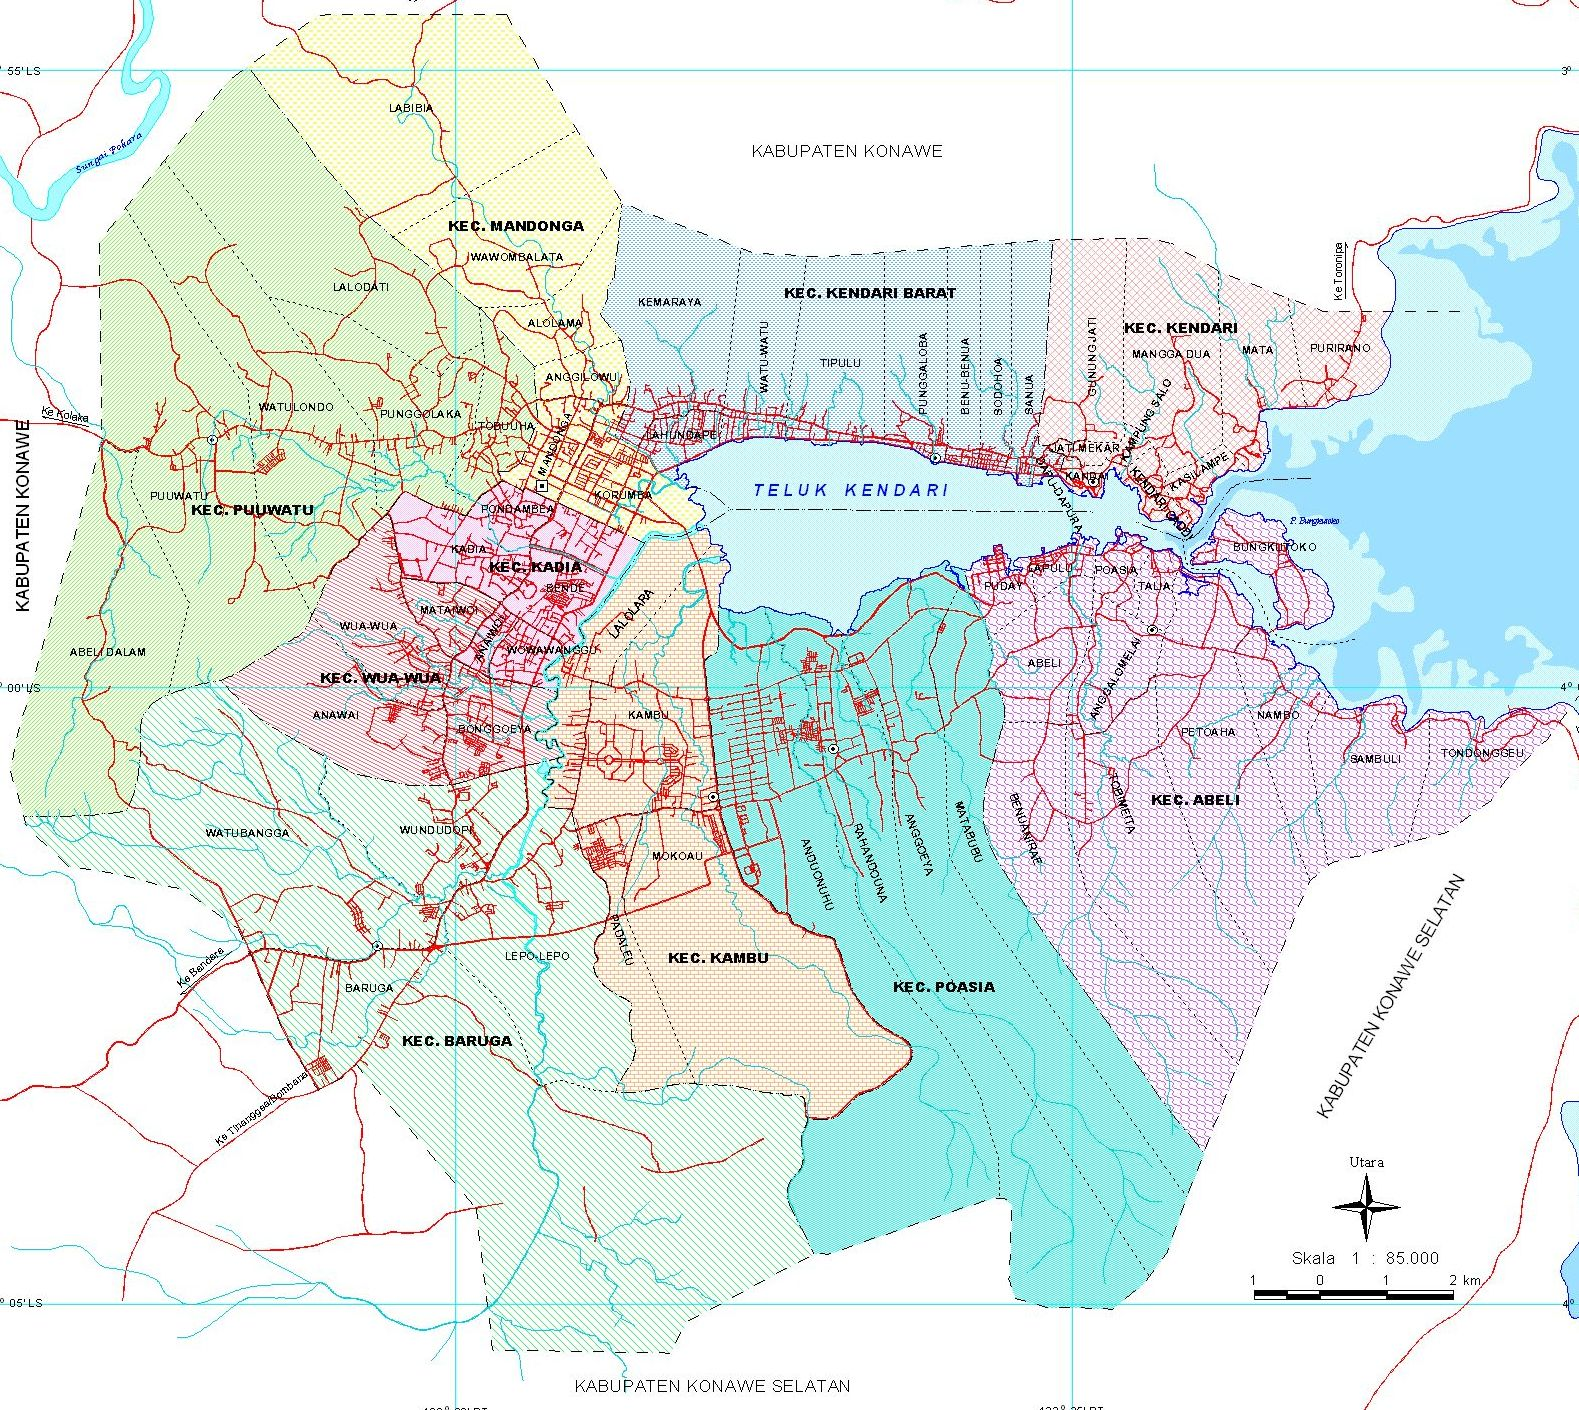 Peta Kota: Peta Kota Kendari